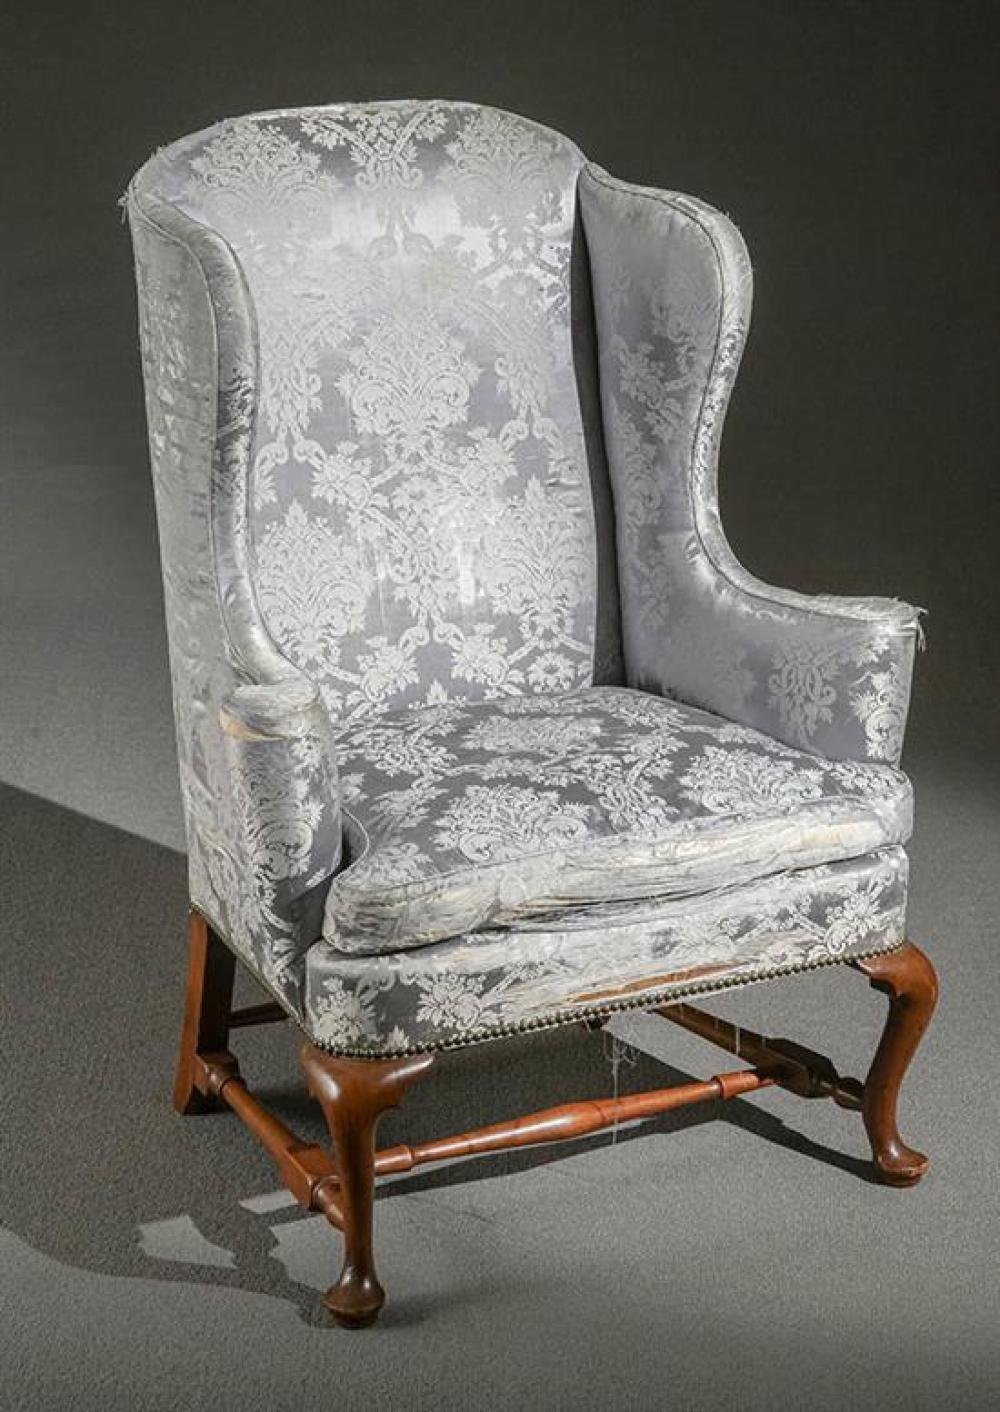 Queen Anne Walnut Wing Armchair, Boston Area, Circa 1760-1780